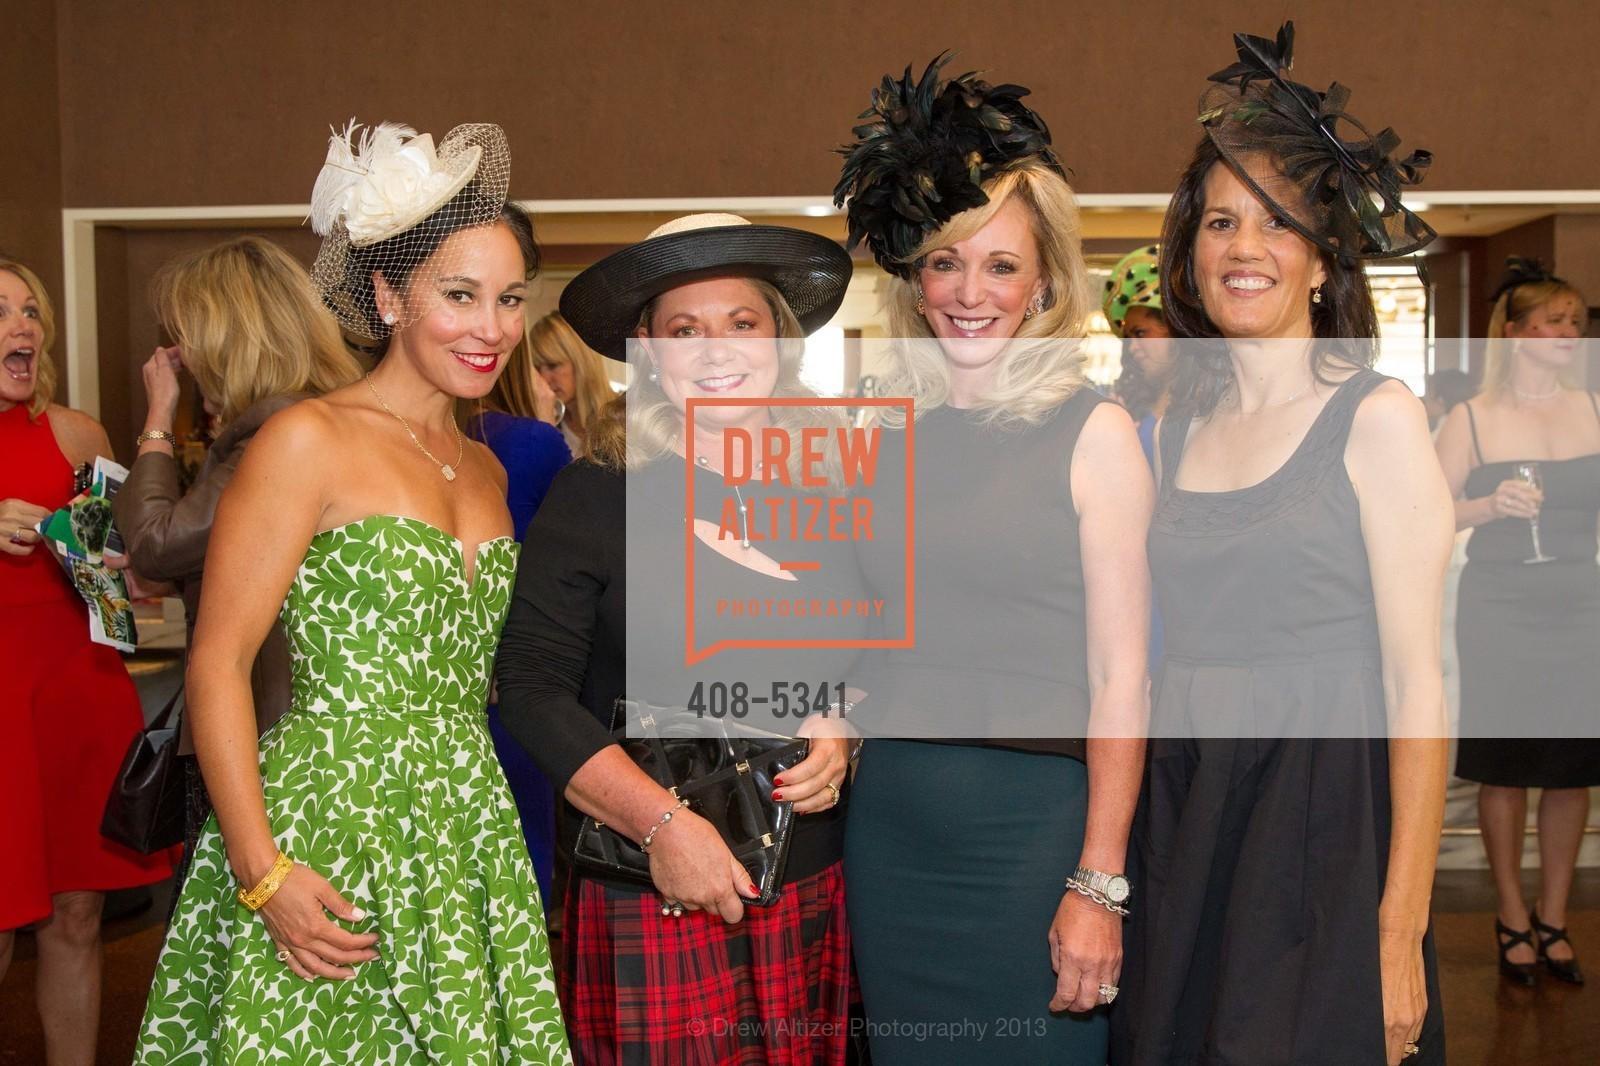 Michelle Molfino, Jill Toth, Patricia Stephens, Laurie Rohrbach, Photo #408-5341